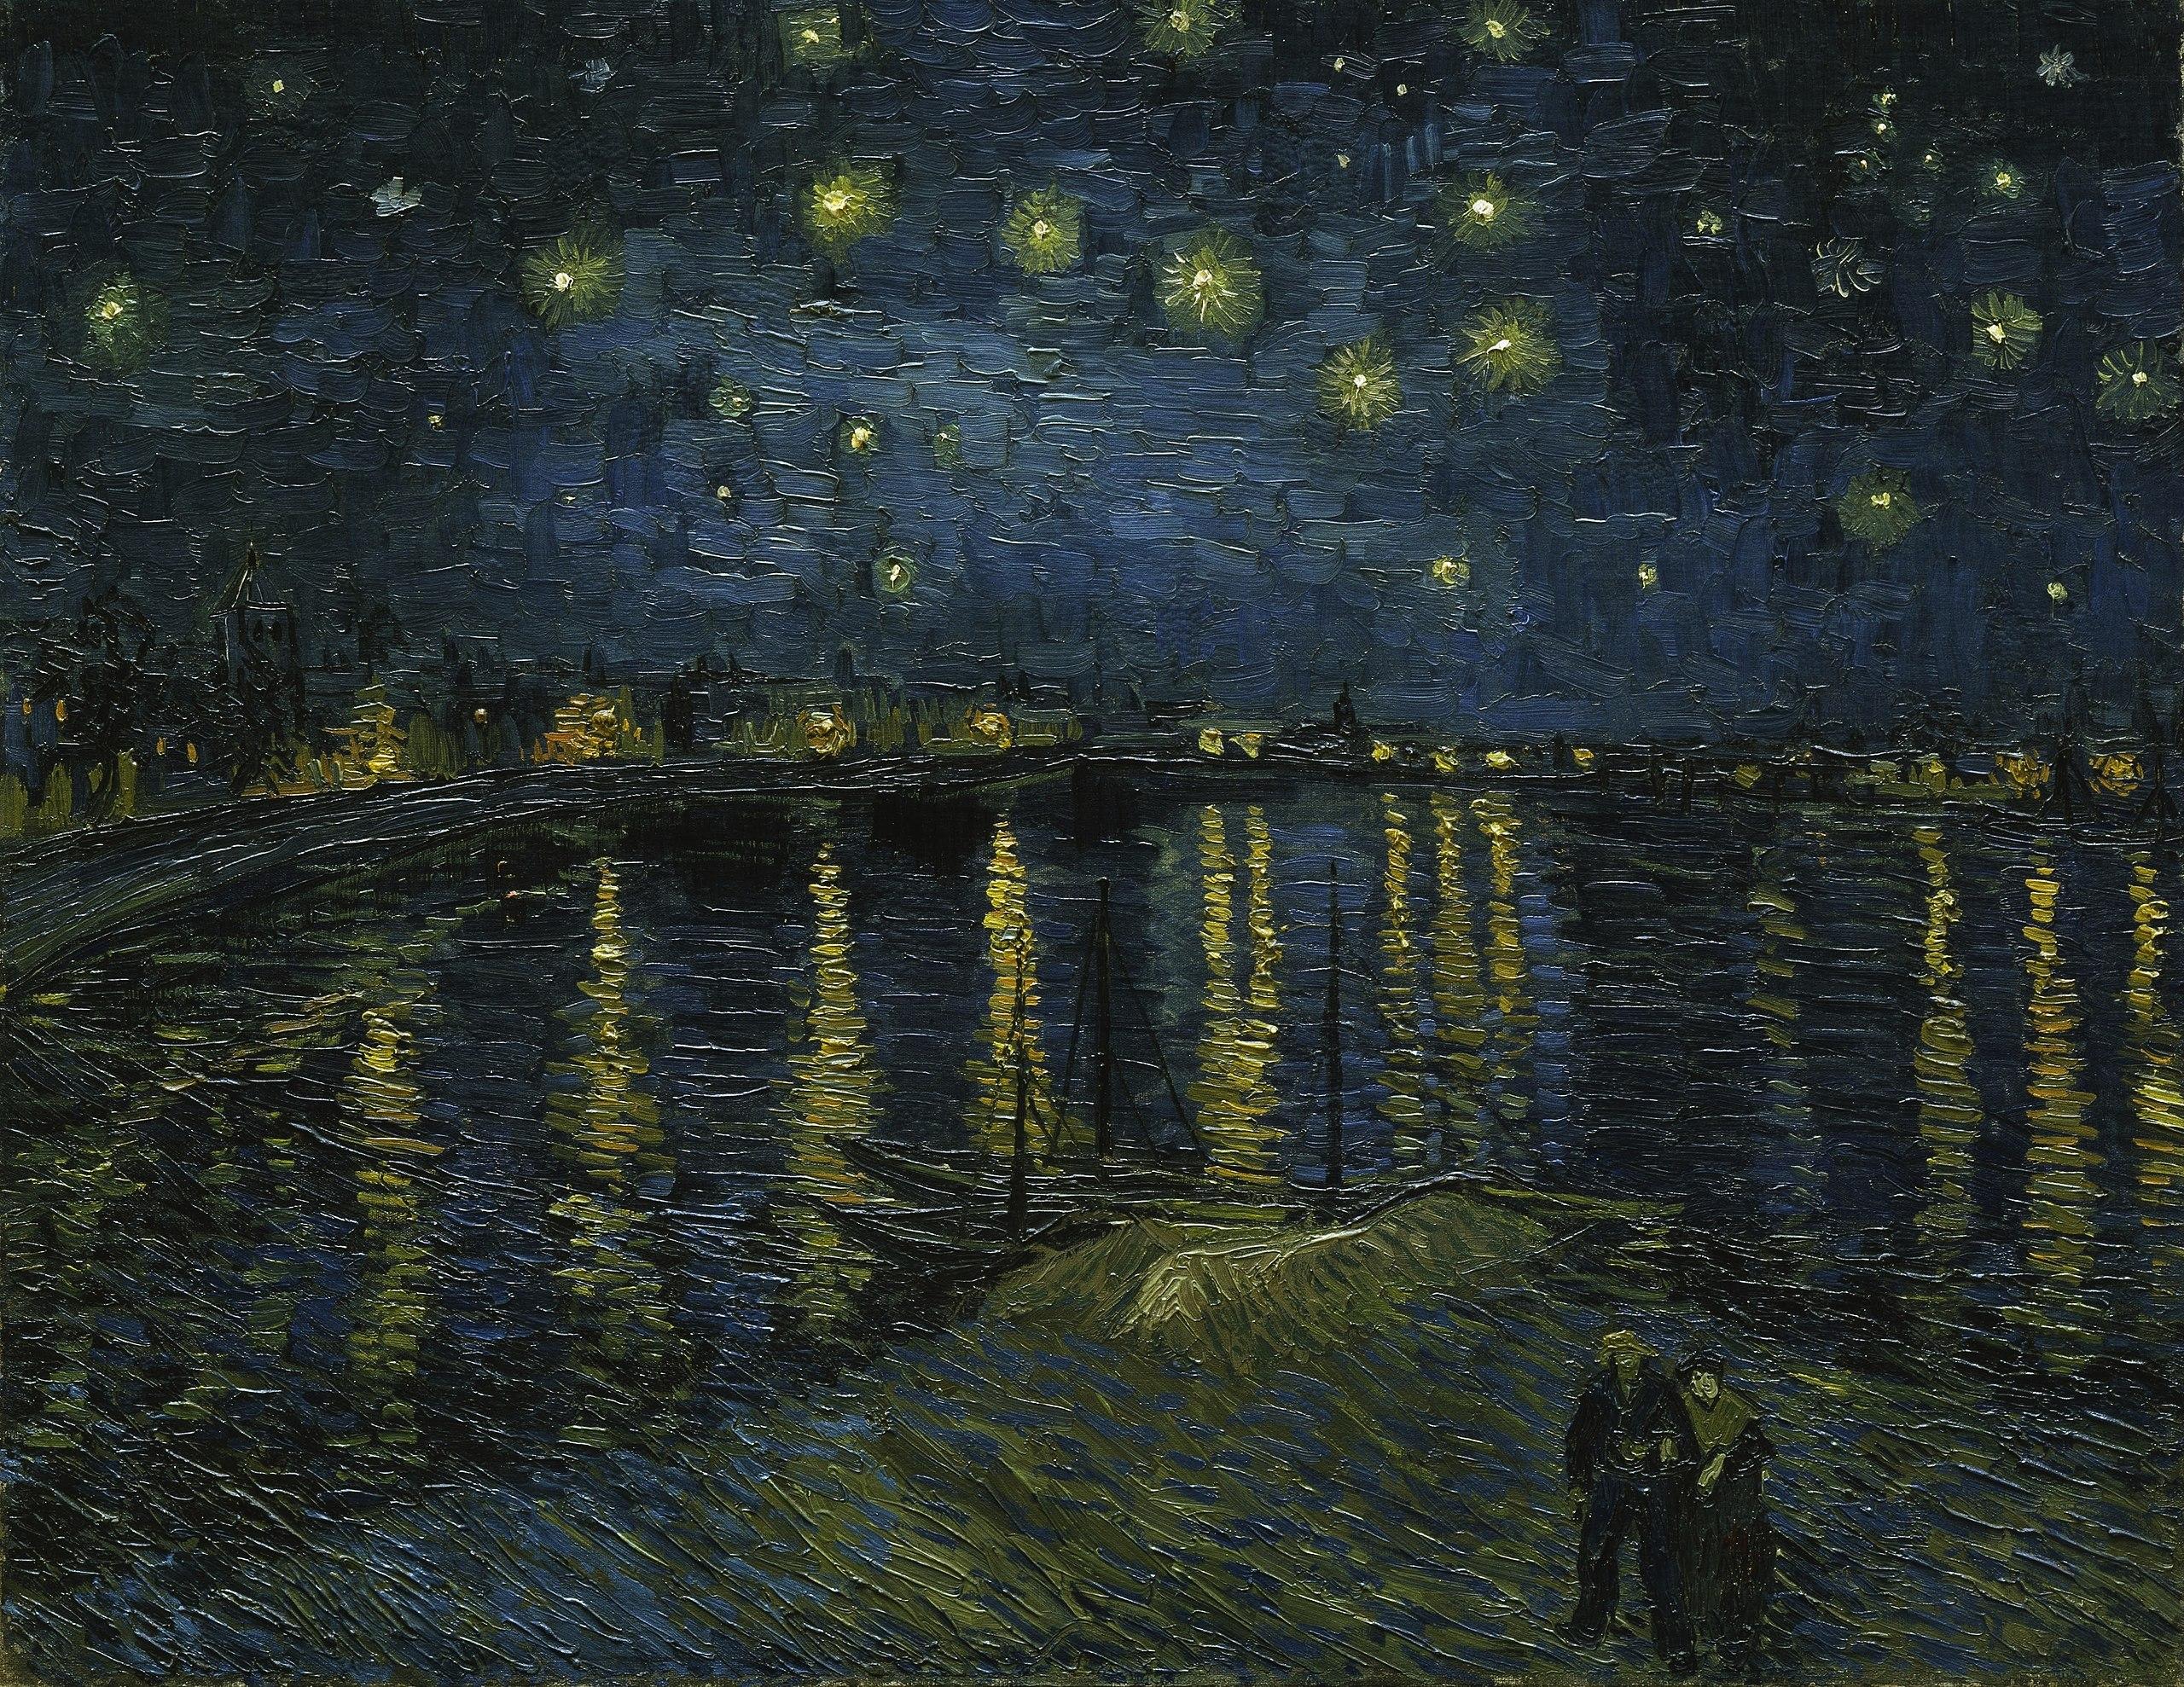 16. Notte stellata sul Rodano - Vincent Van Gogh (1888) - Musée d'Orsay, Parigi